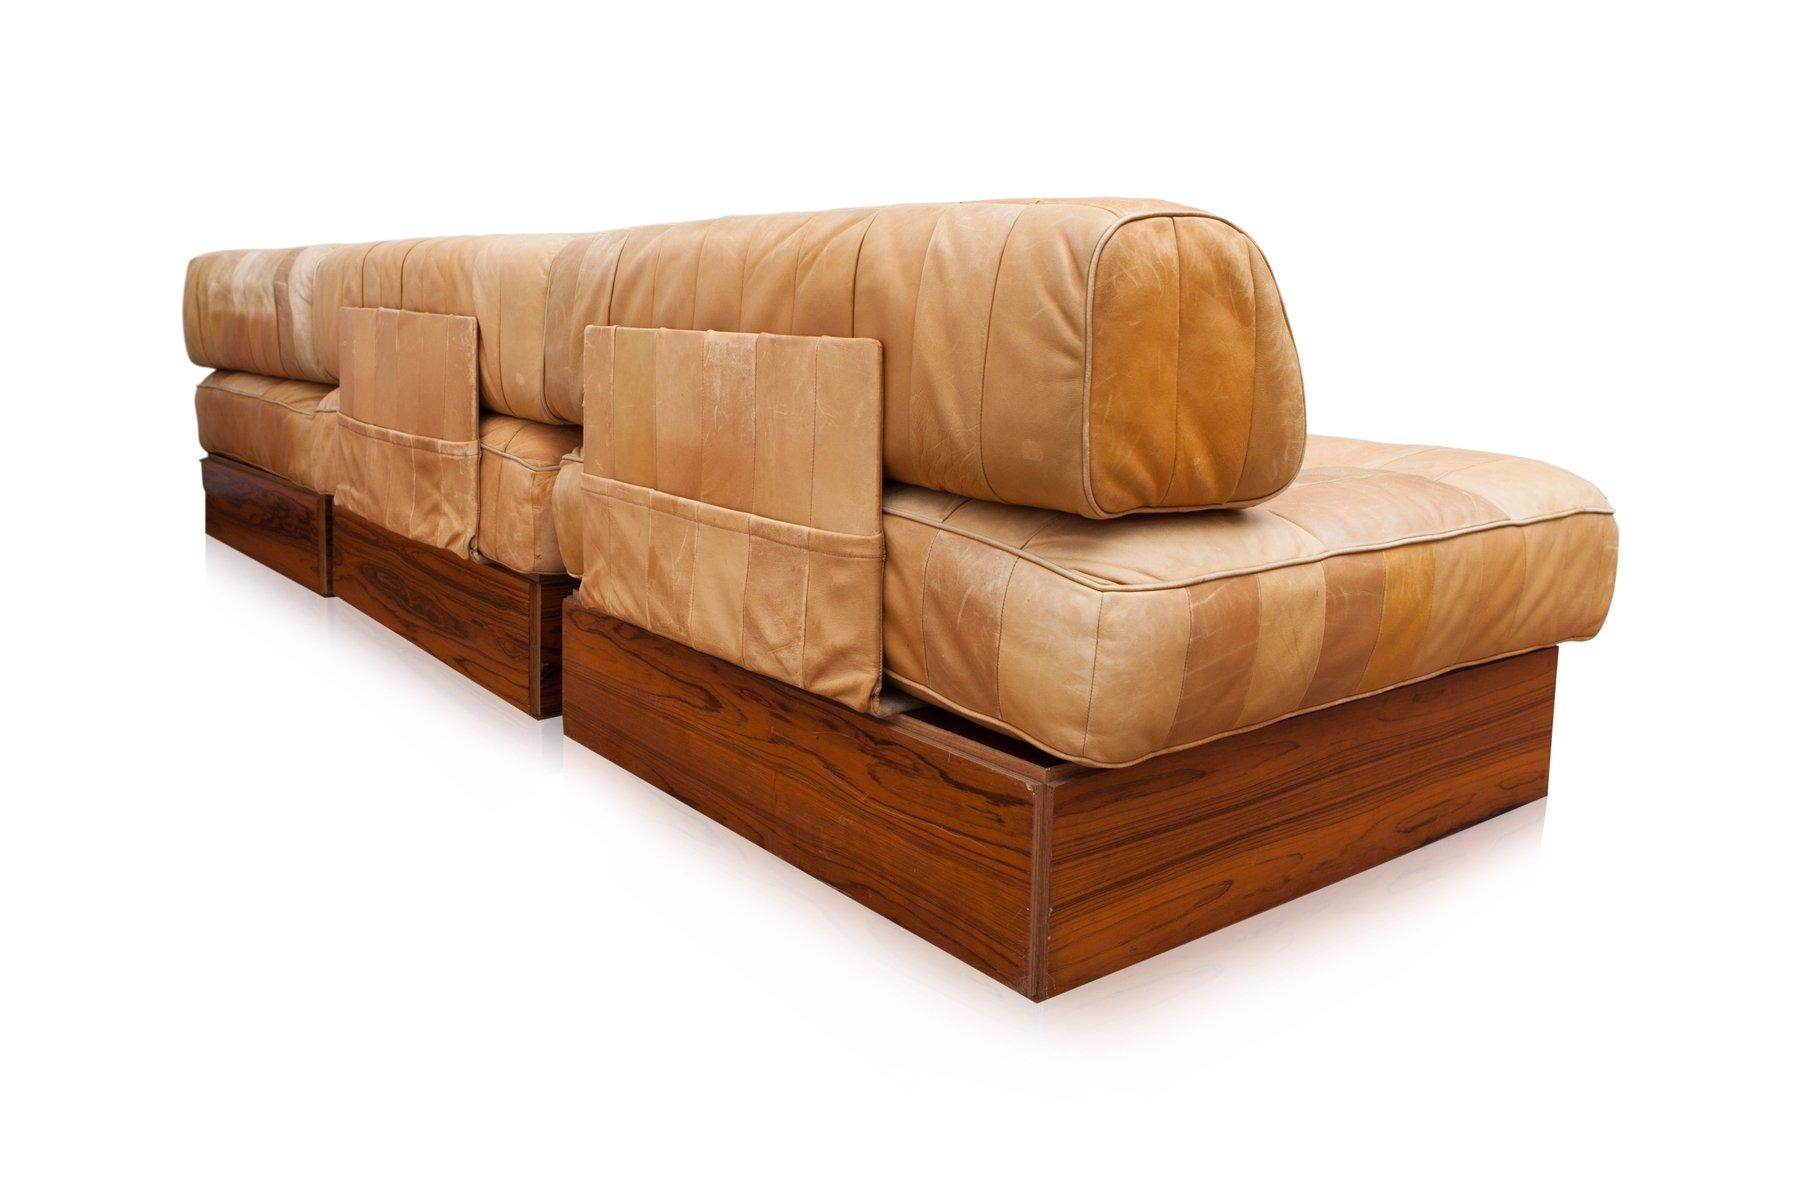 modulares mid century ds 88 sofa von de sede 1970er bei. Black Bedroom Furniture Sets. Home Design Ideas